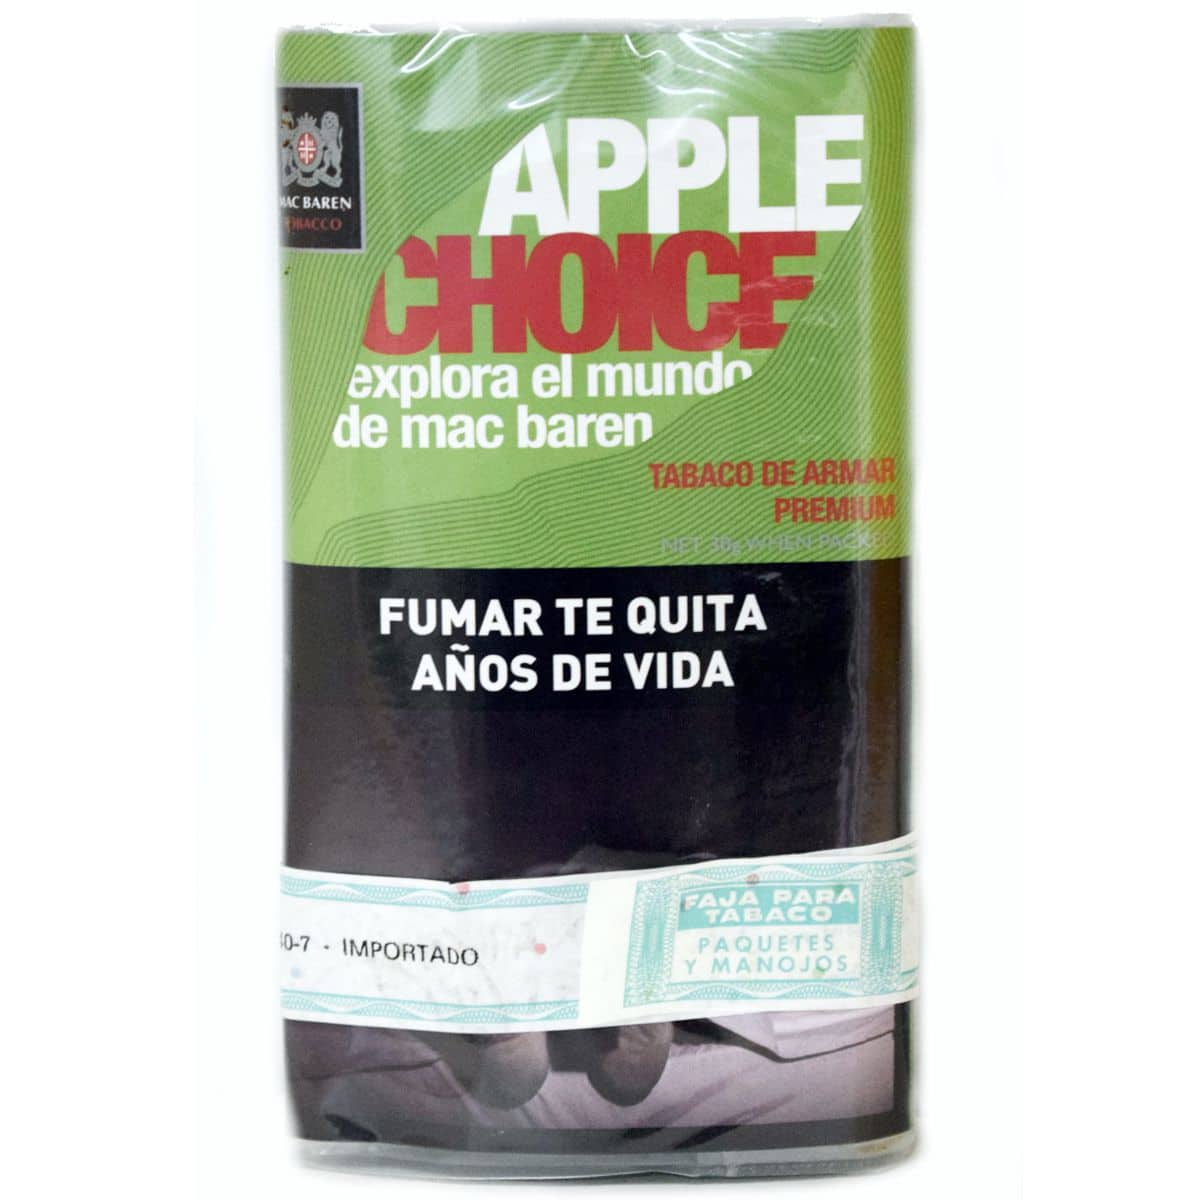 tabaco mac baren apple precio tabaqueria